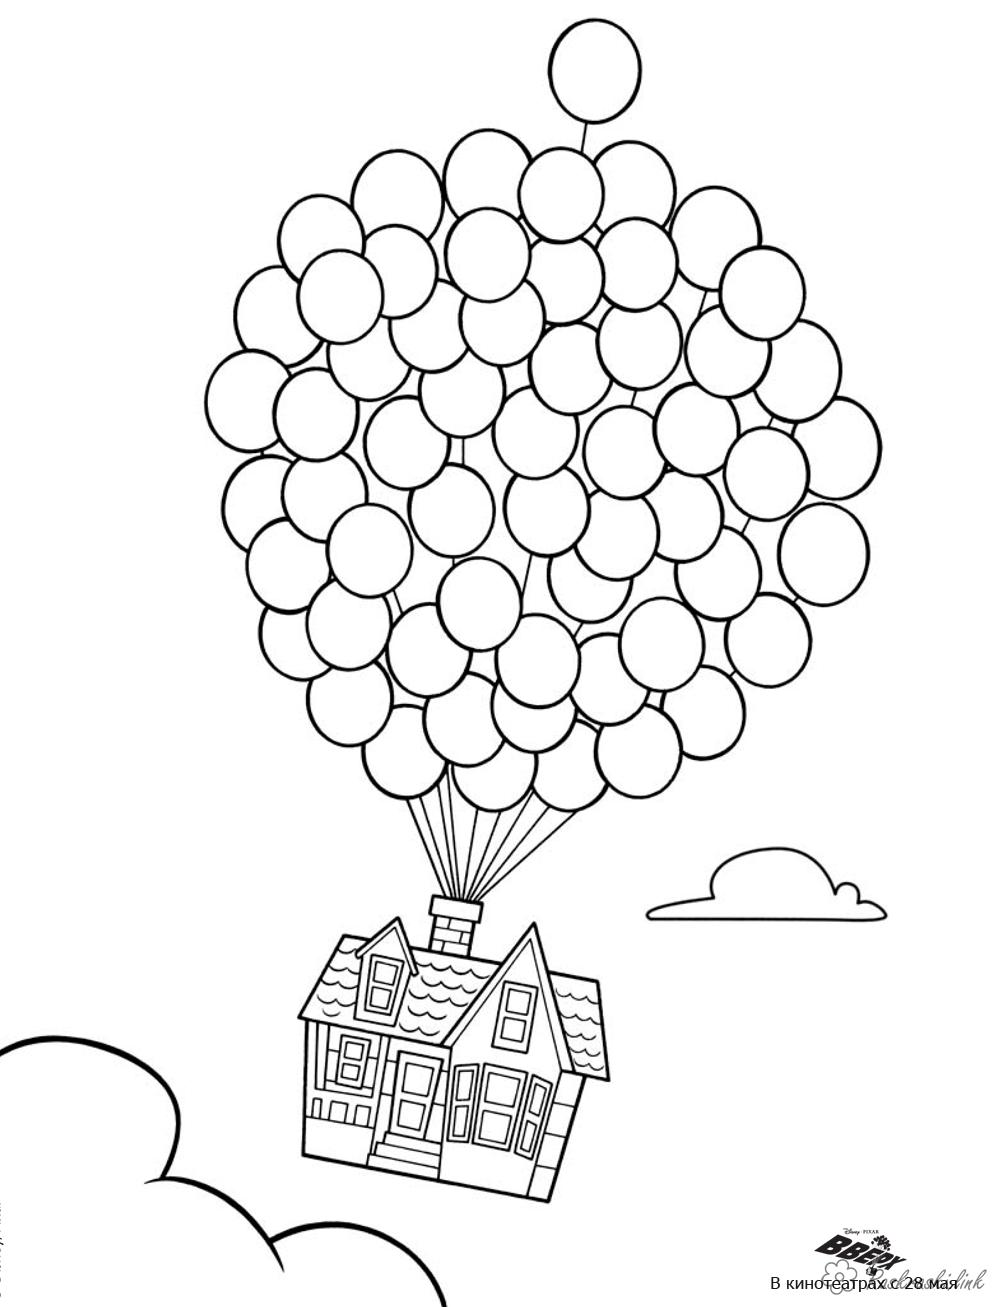 Coloring Up Brave coloring pages, coloring pages cartoons, house, balloons